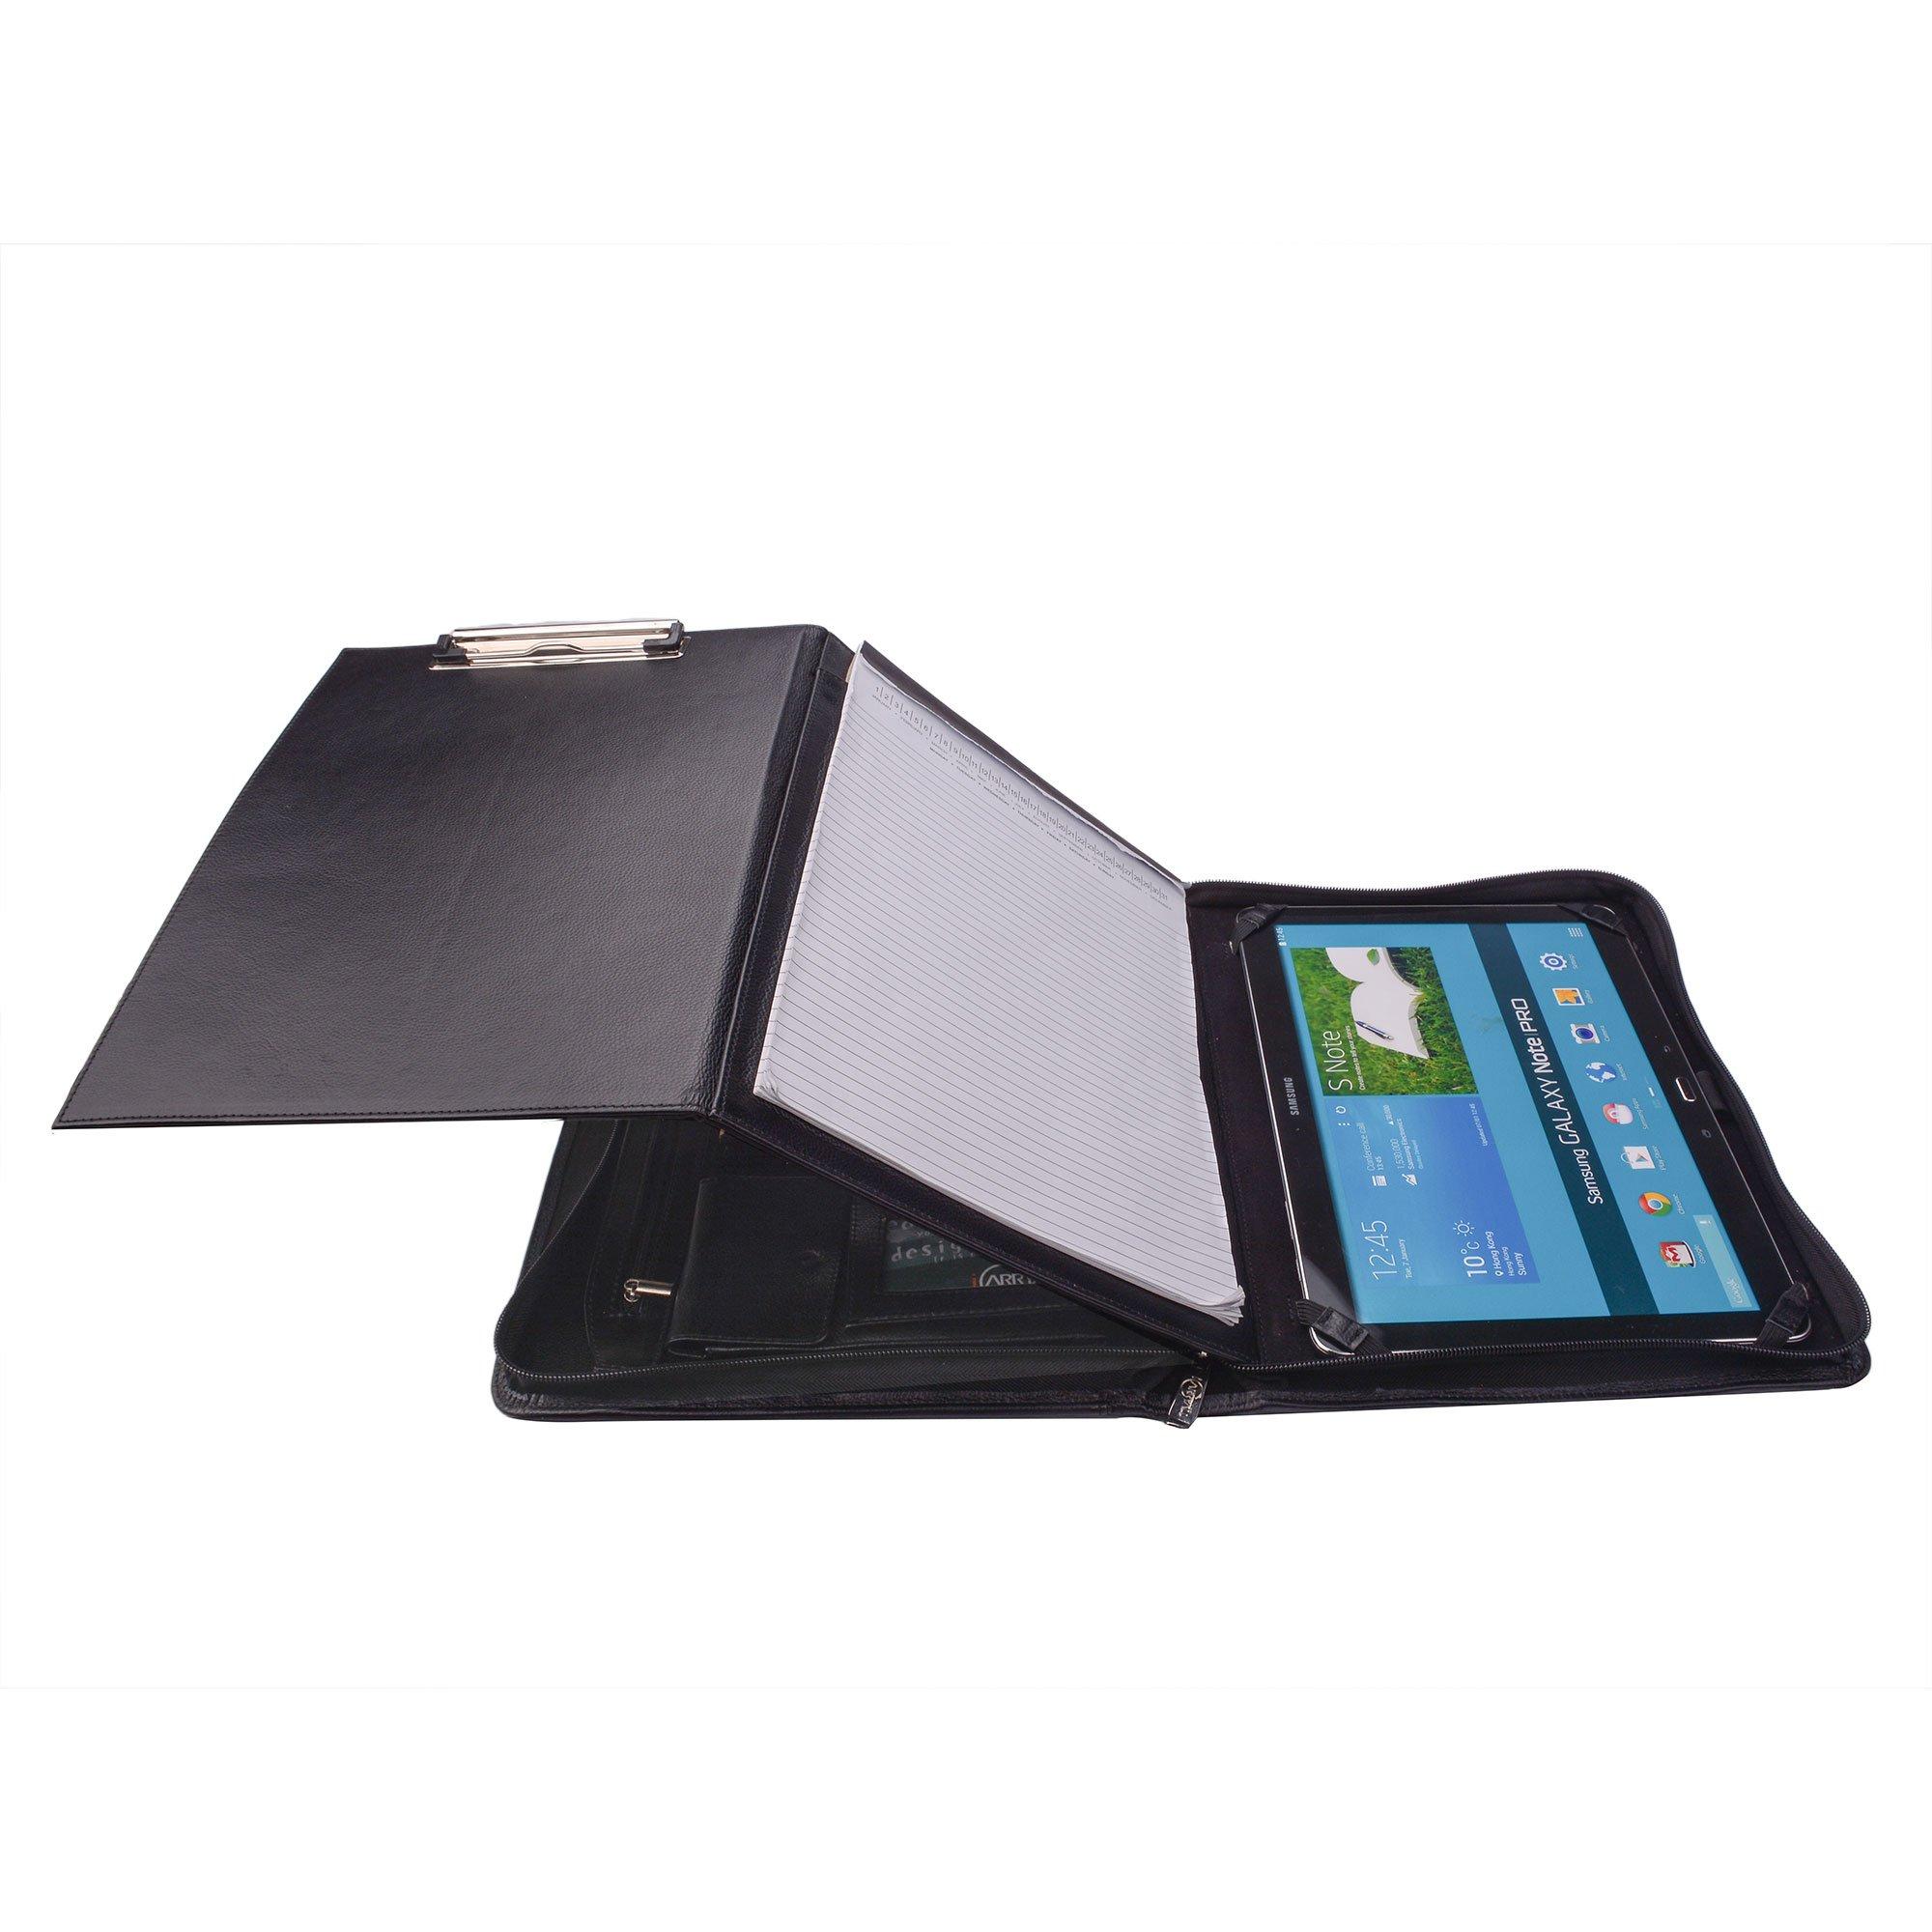 Premium Leather Organizer Padfolio with Folding Center Panel, for SamsungGalaxyNotePro12.2,Black